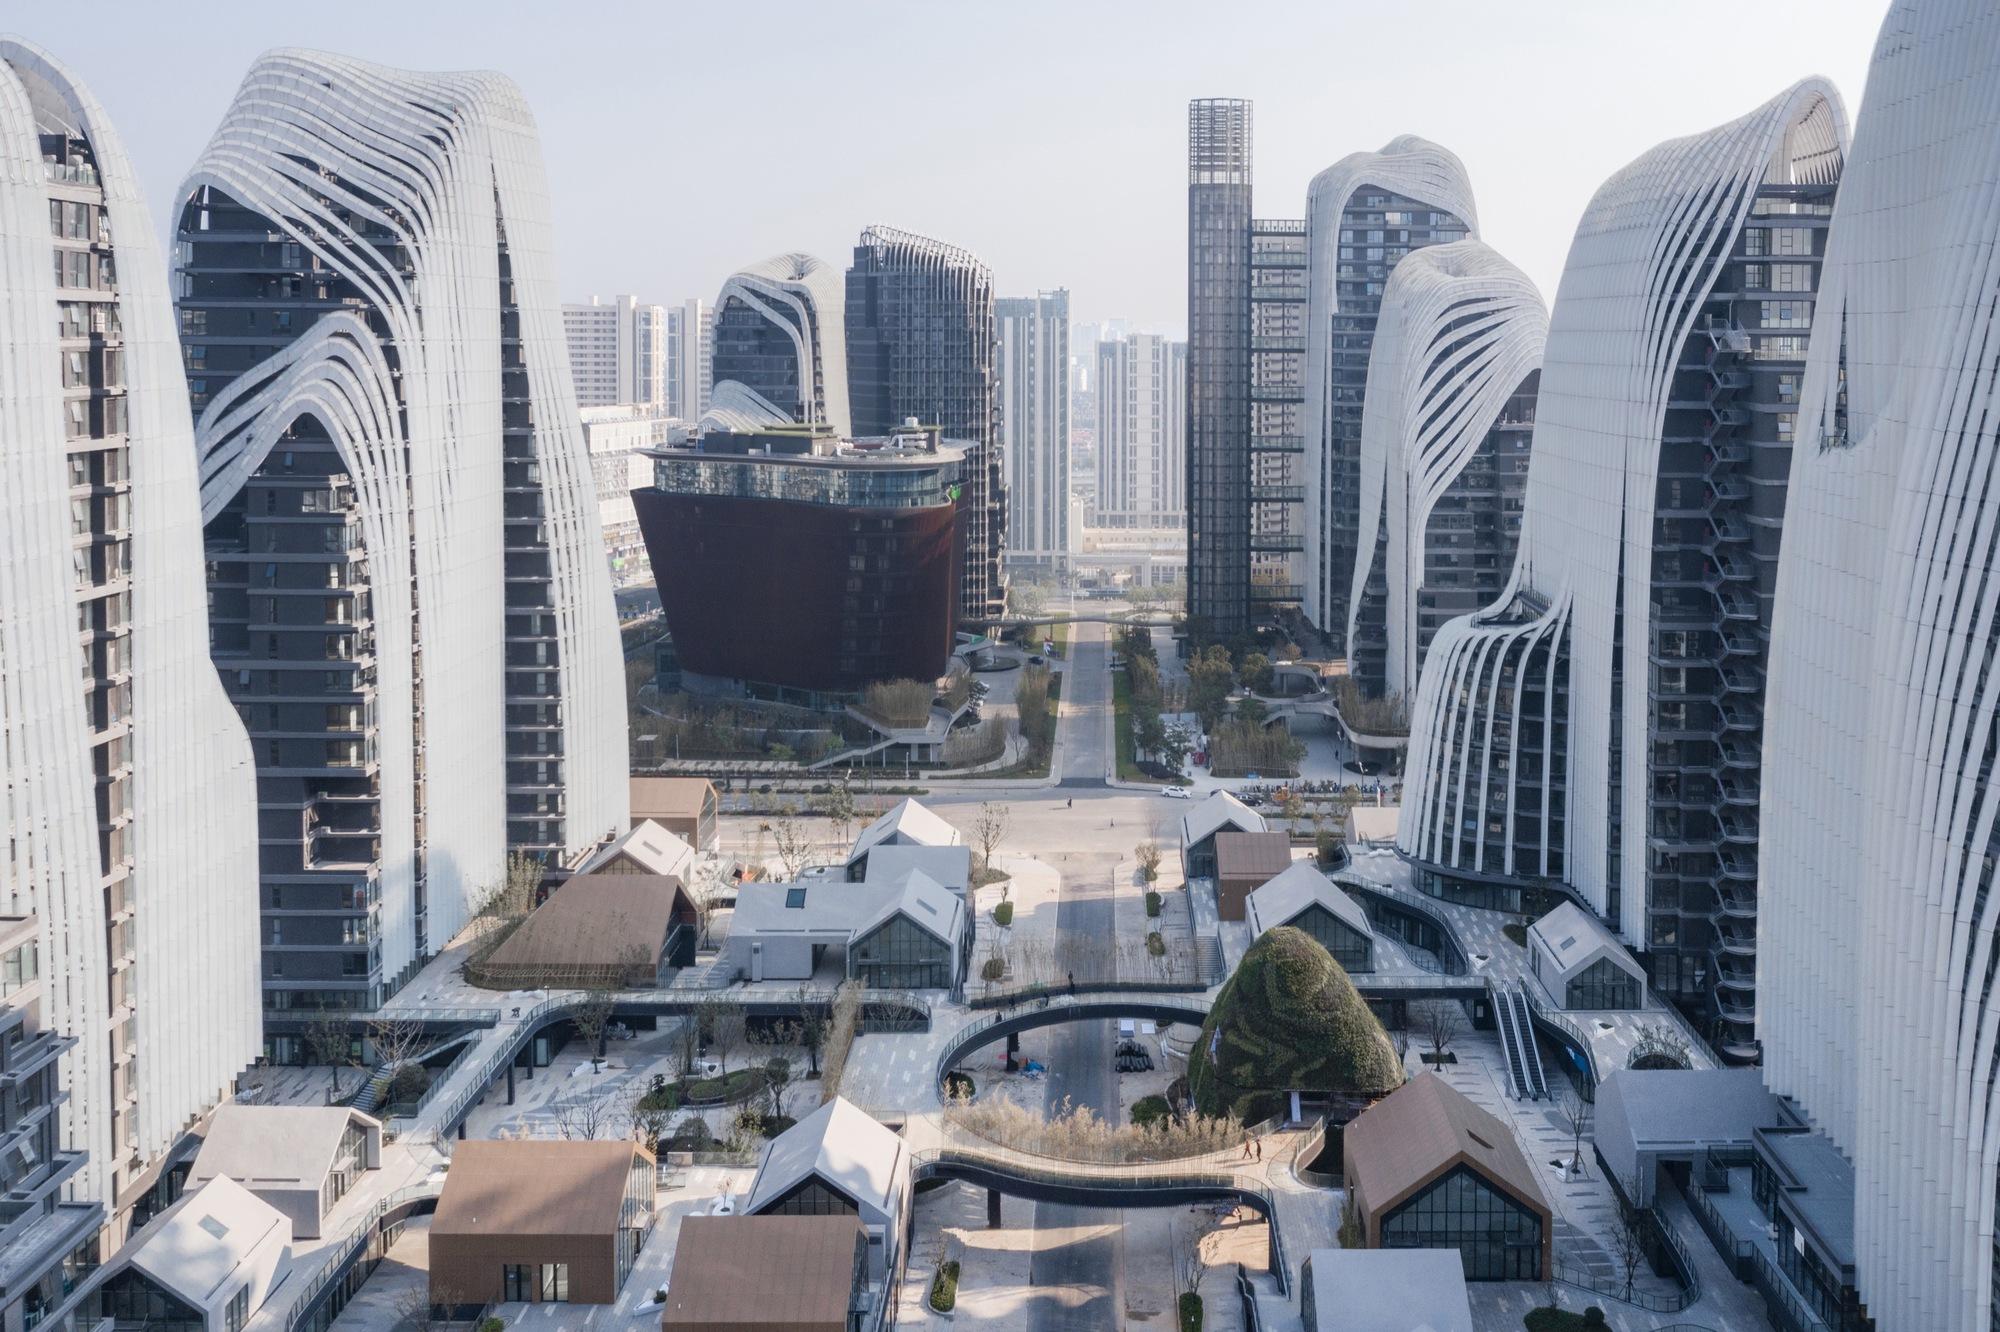 Kota ramah pelajar di China - Nanjing